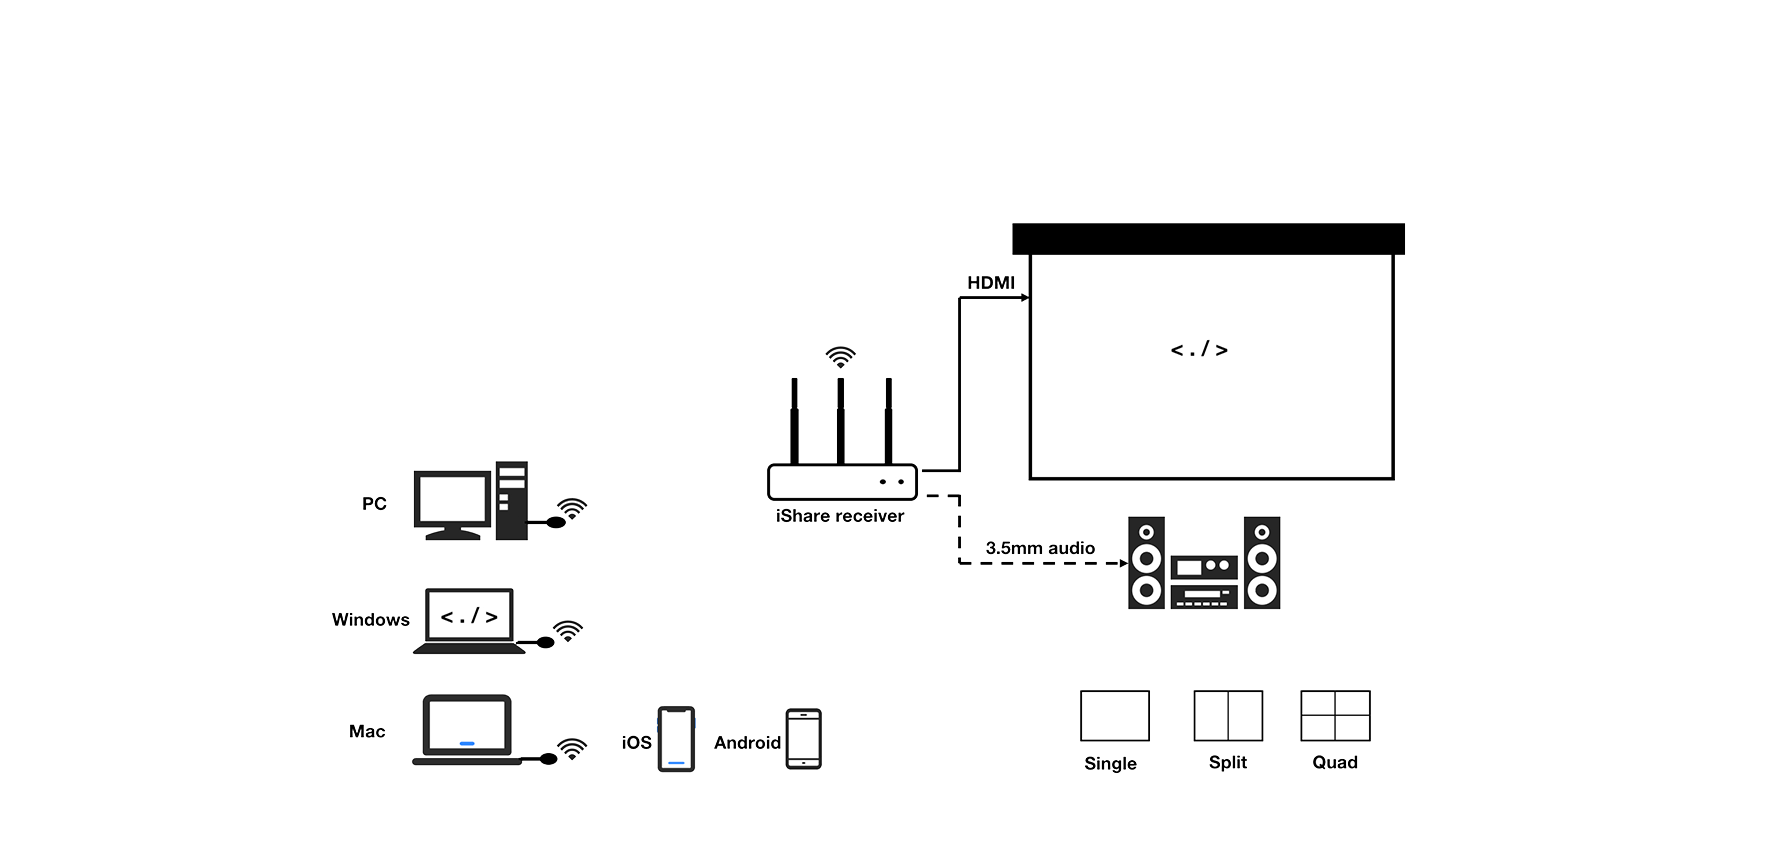 iShare Wireless Presentation BYOD